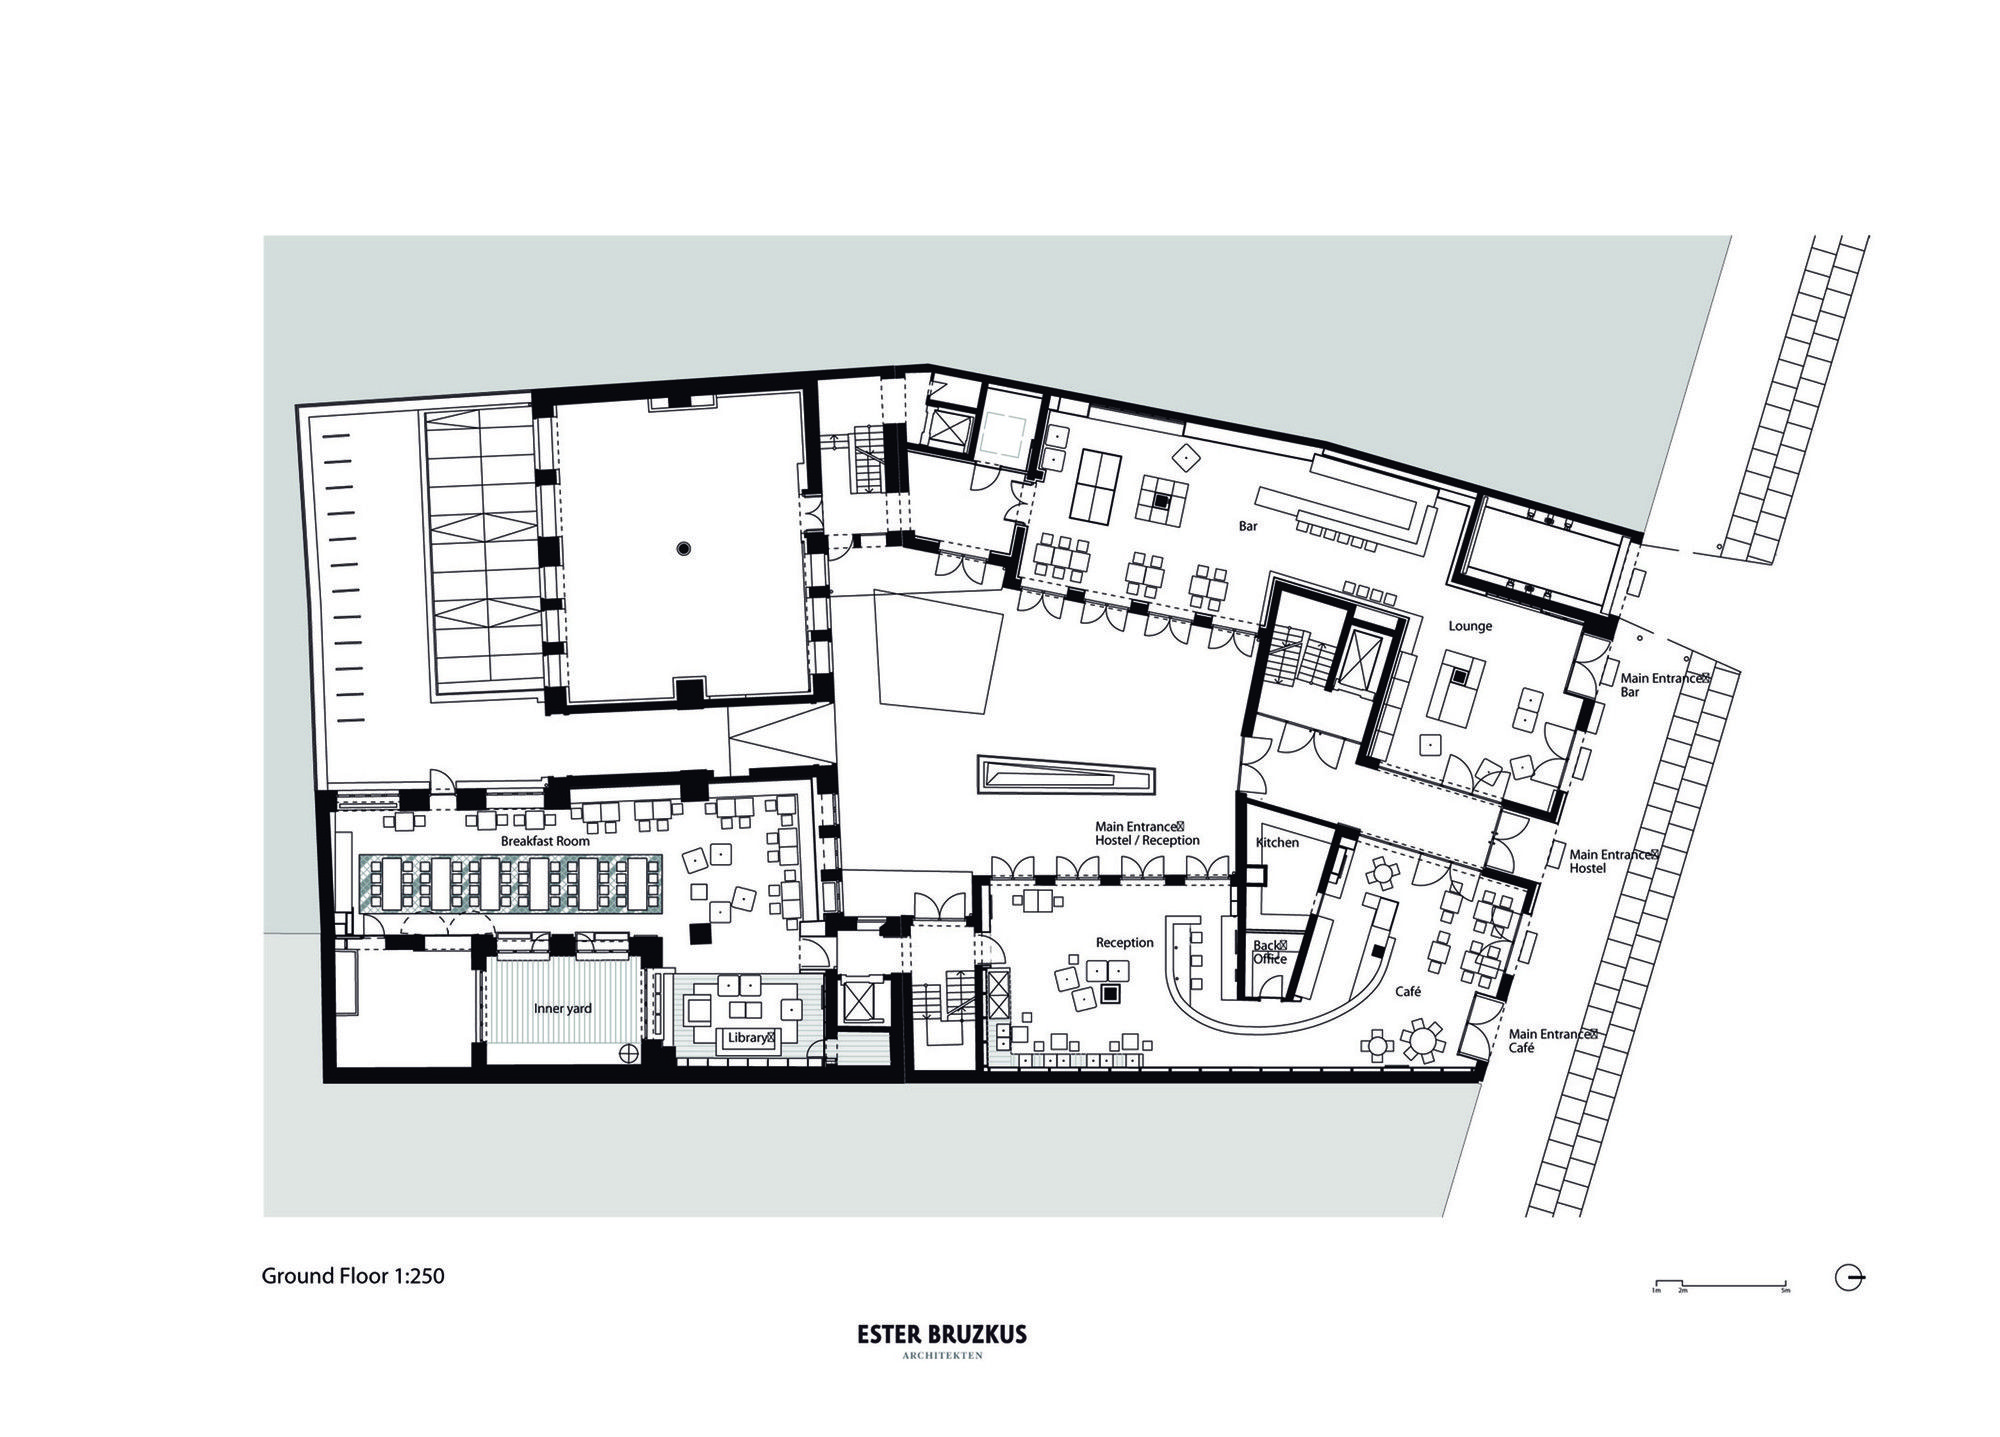 Gallery of Generator Berlin Mitte Ester Bruzkus DesignAgency 14